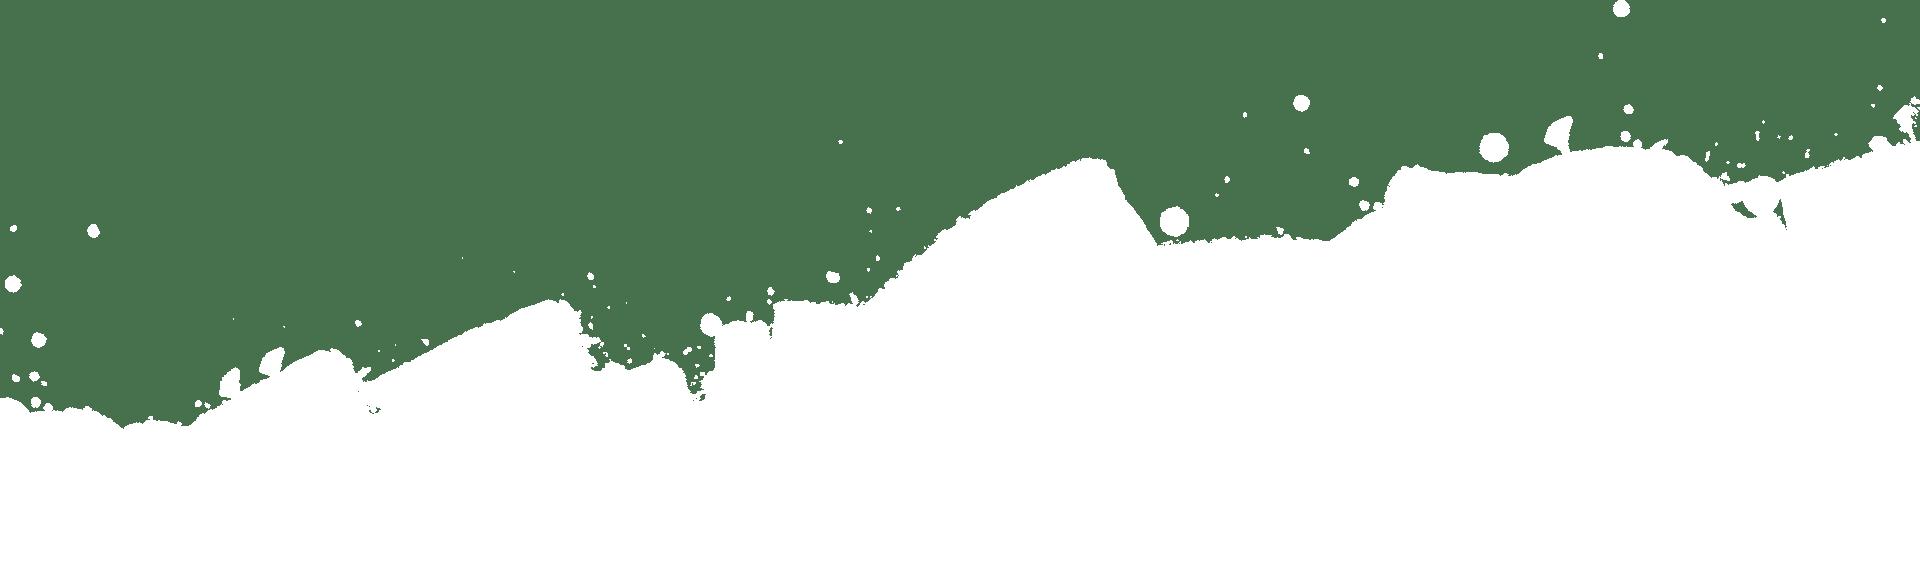 top-snowdivider